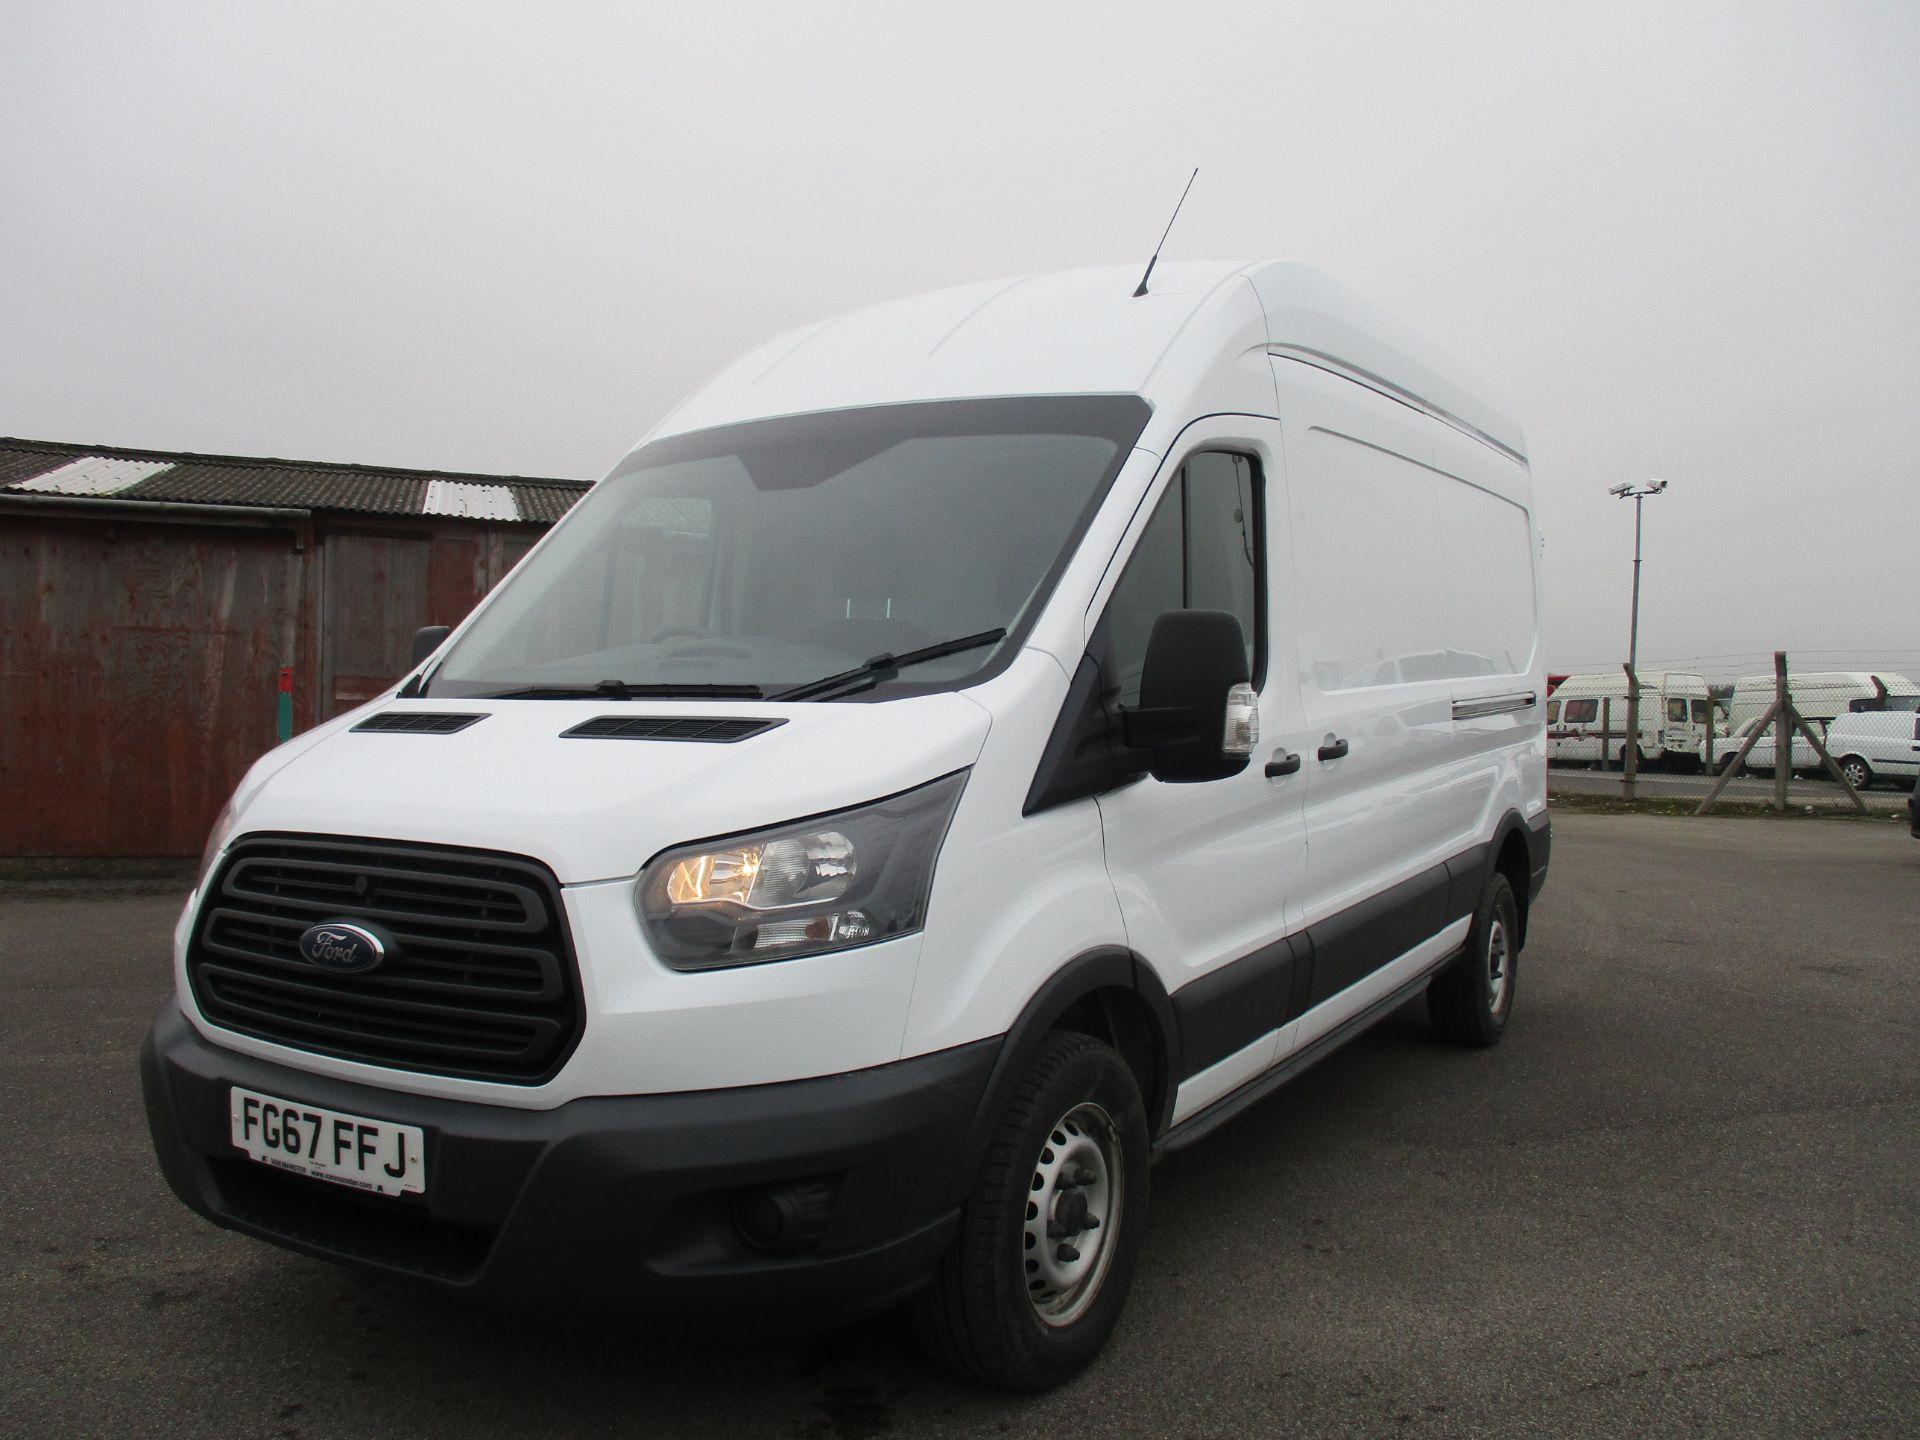 2017 Ford Transit L3 H3 VAN 130PS EURO 6 (FG67FFJ) Image 3